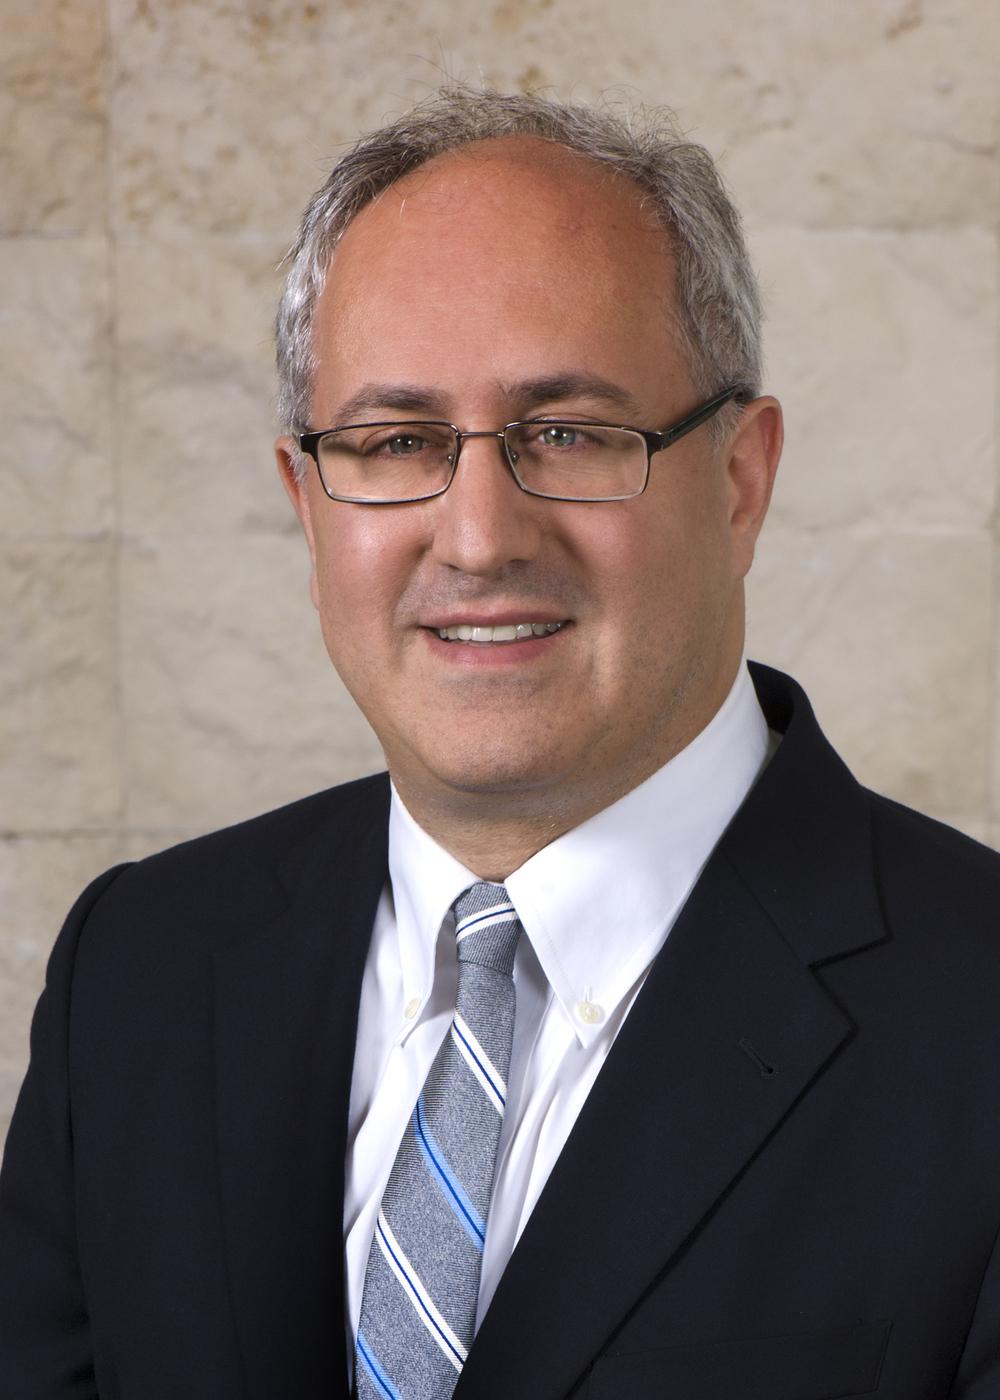 JOHN KIRSNER, Vice Chair